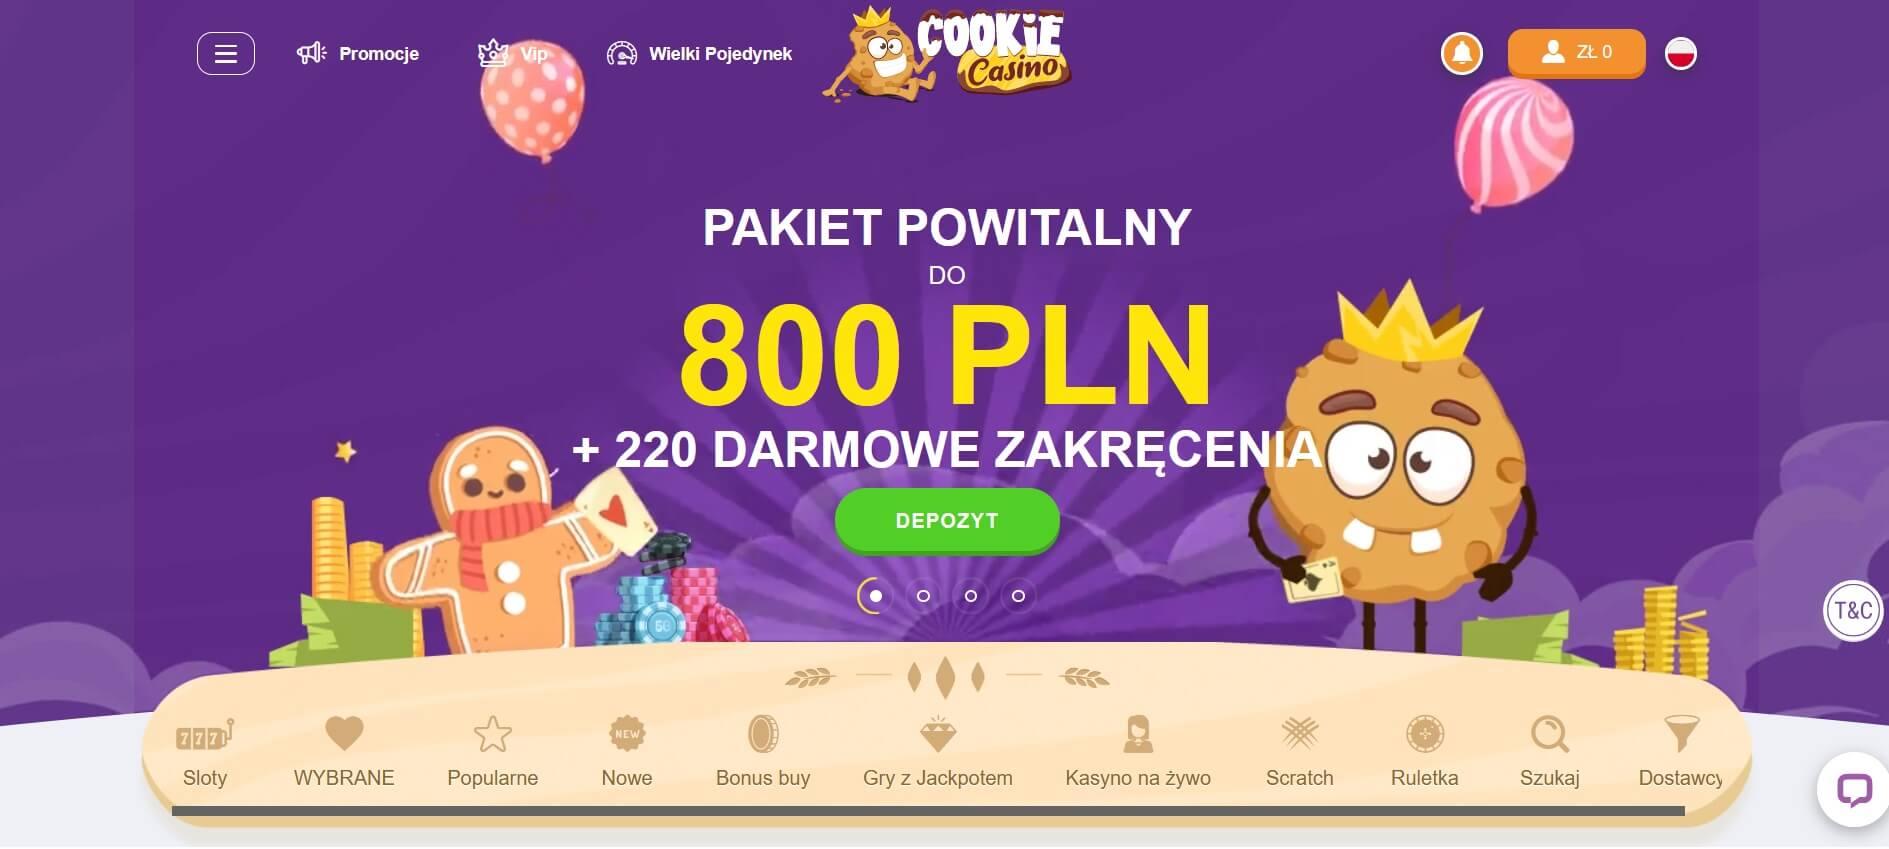 cookie casino bonus powitalny screenshot